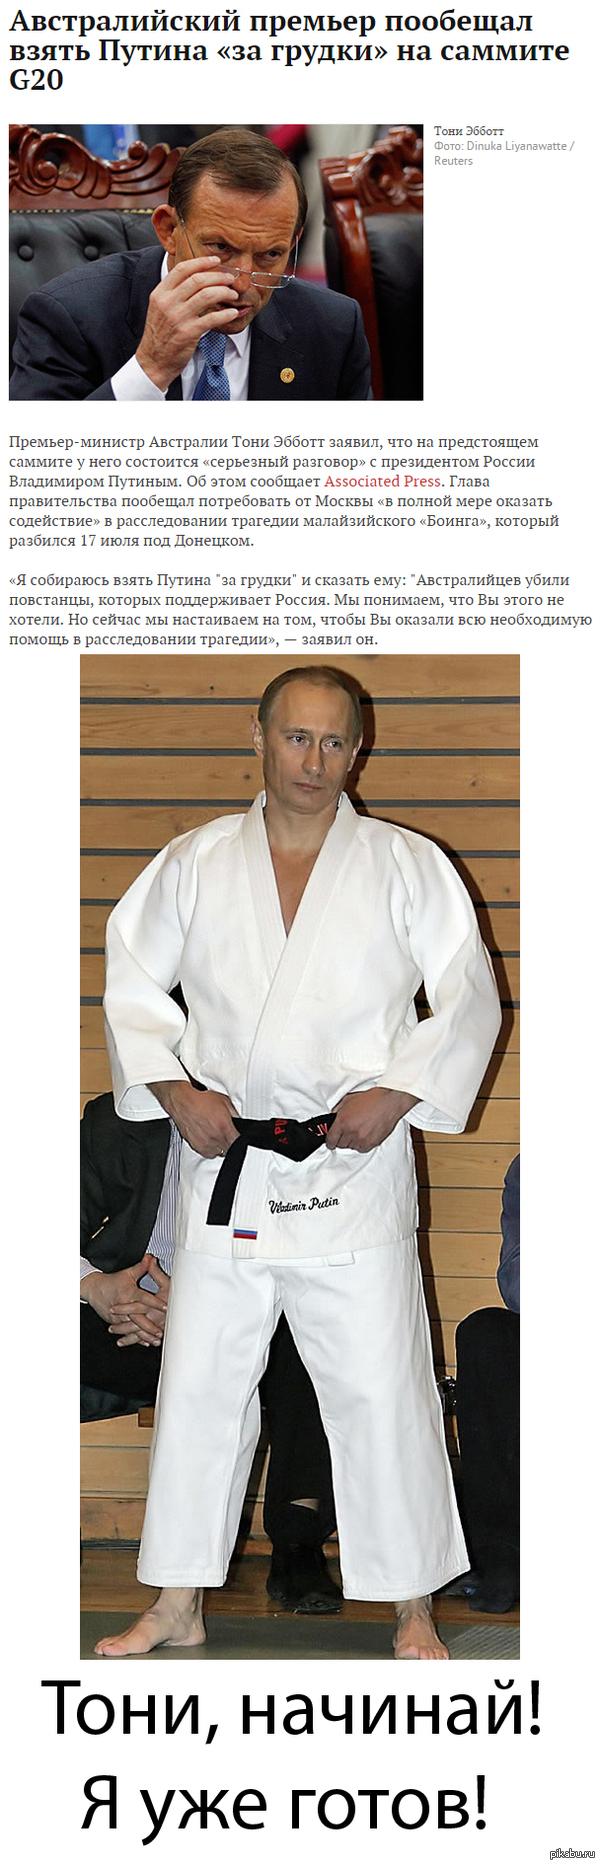 Тони Эбботт против Владимира Путина